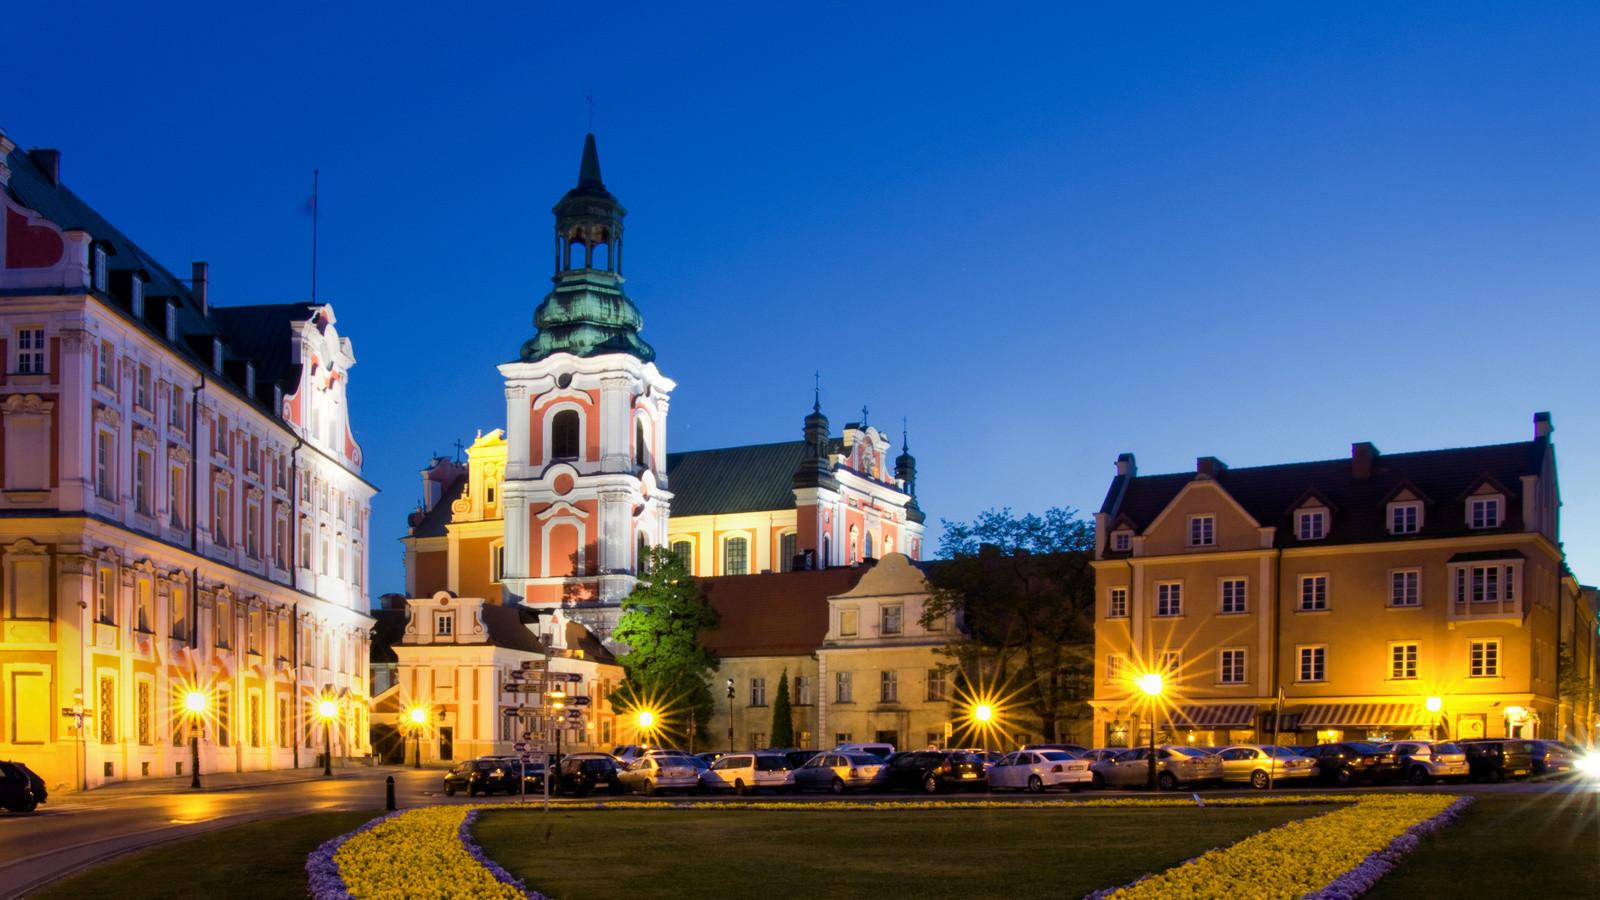 Expérience à Poznań, en Pologne par Weronika